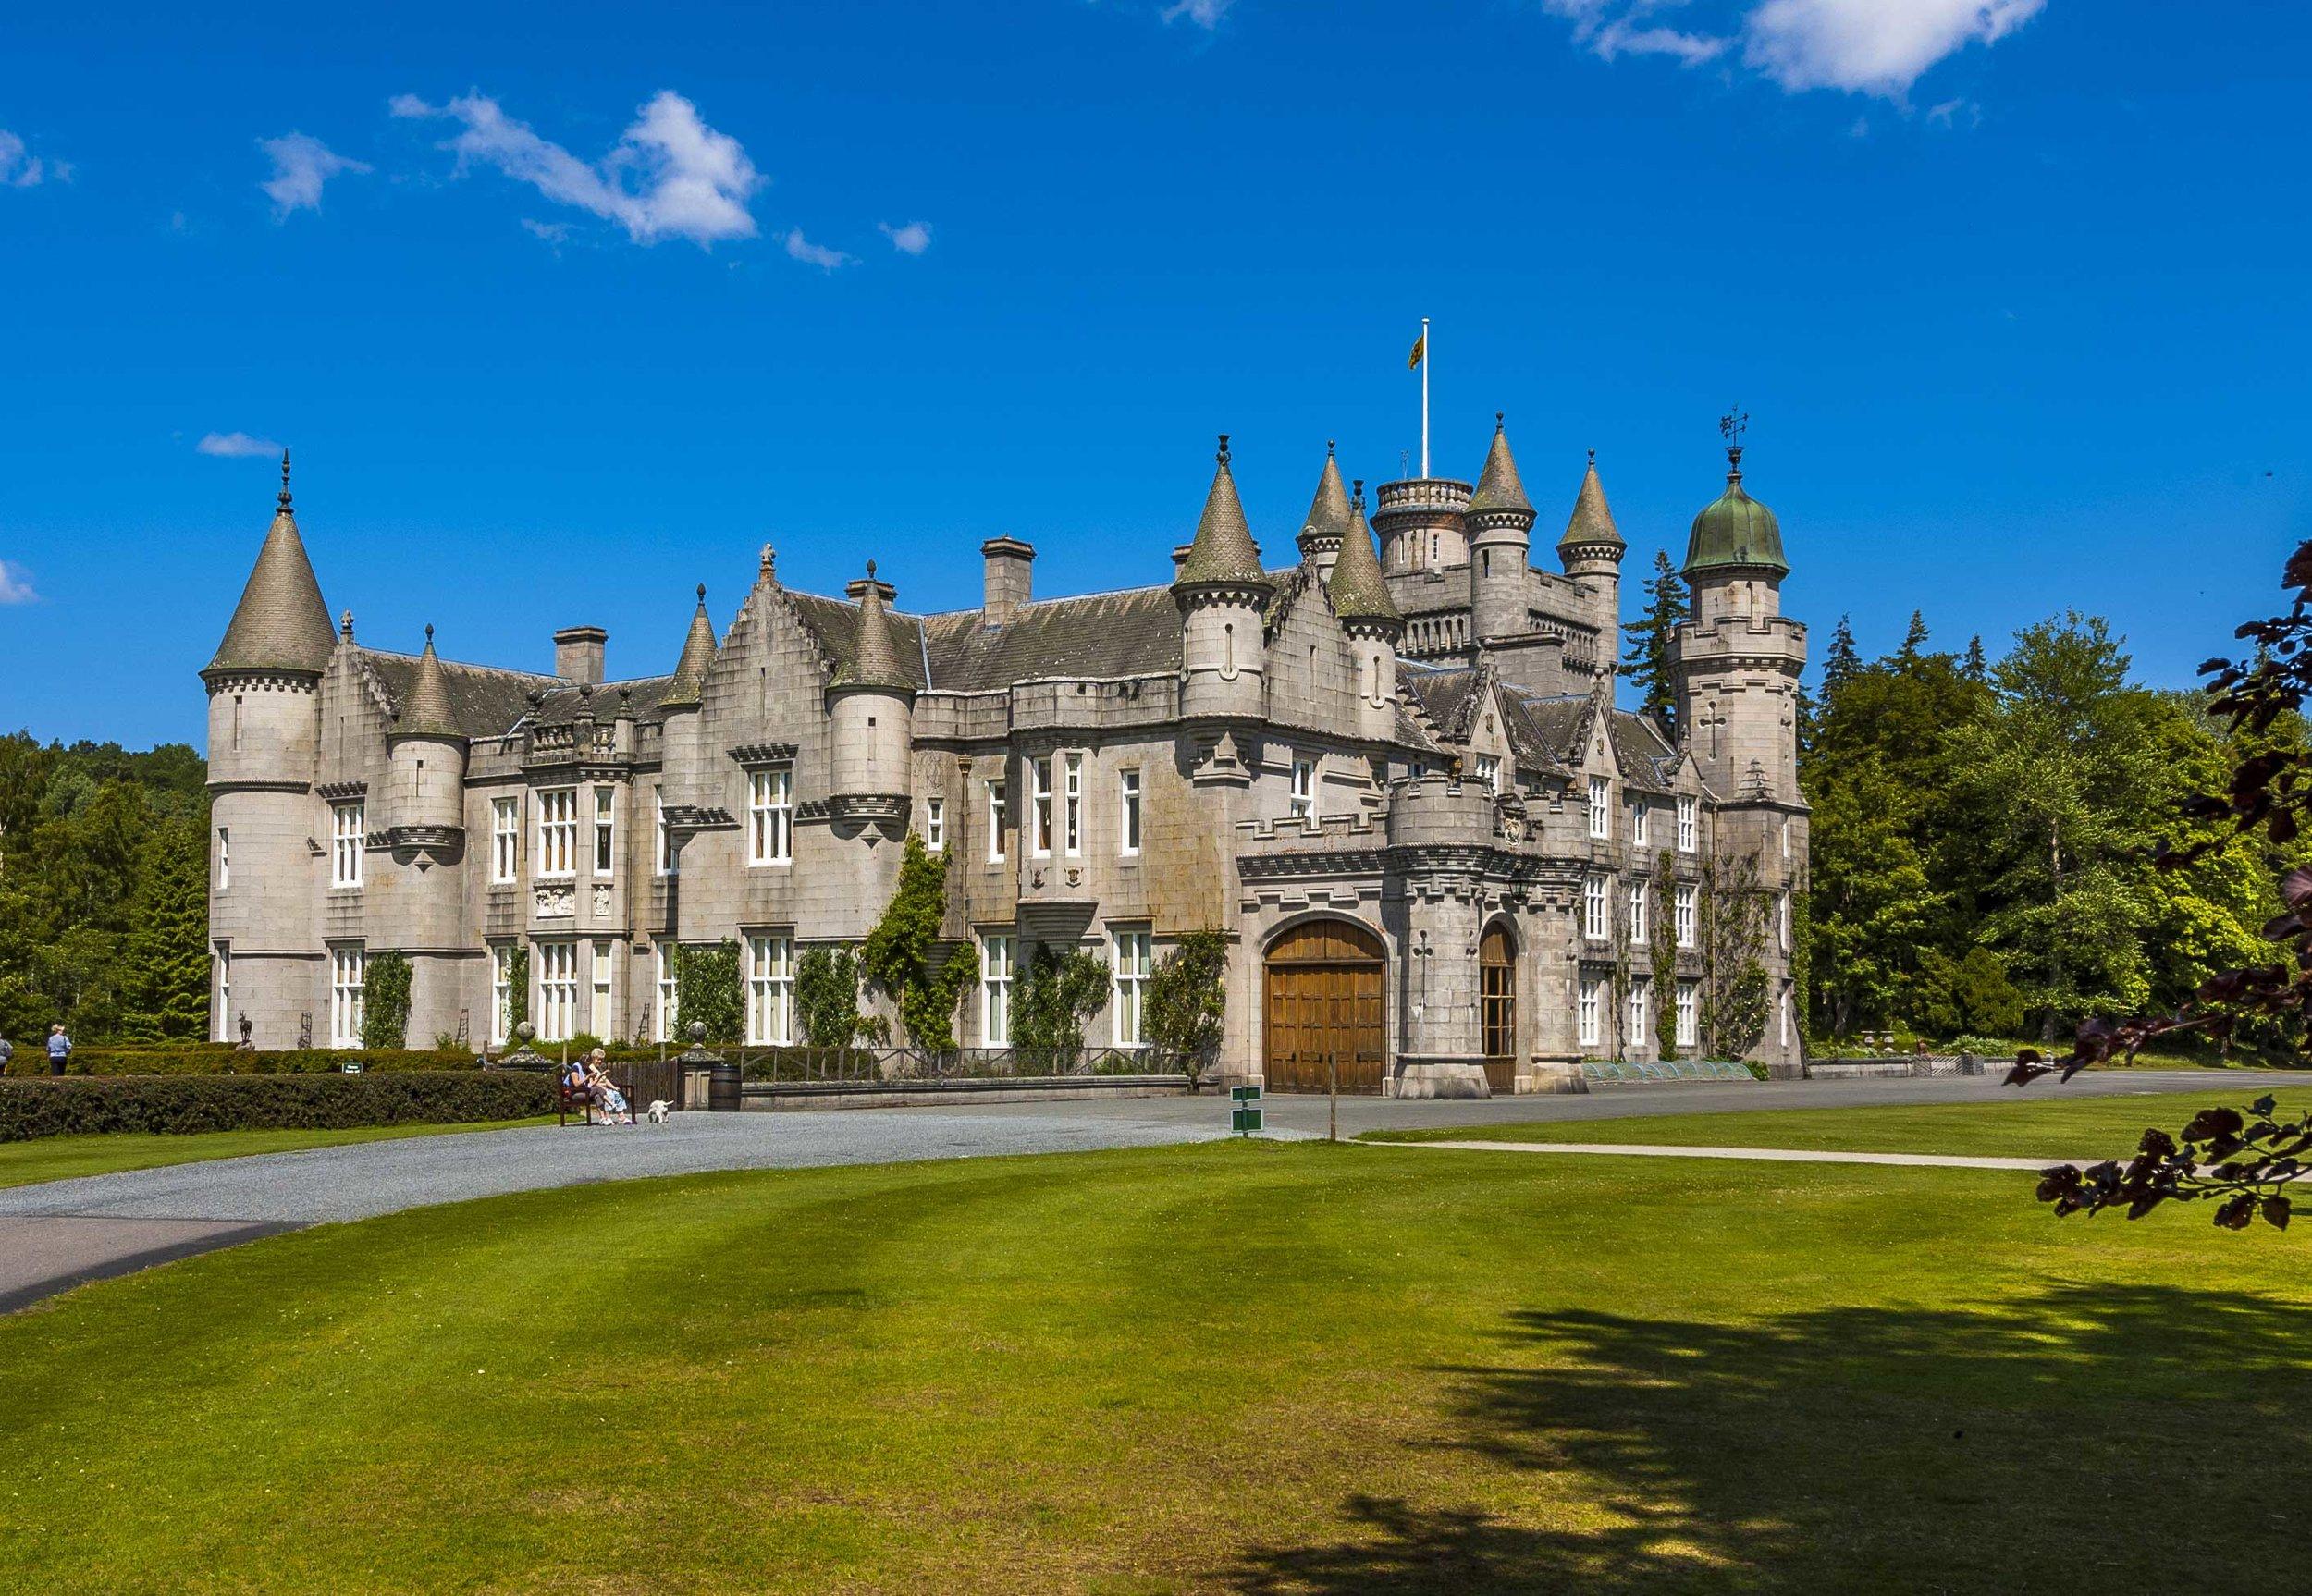 Balmoral-castle.jpg